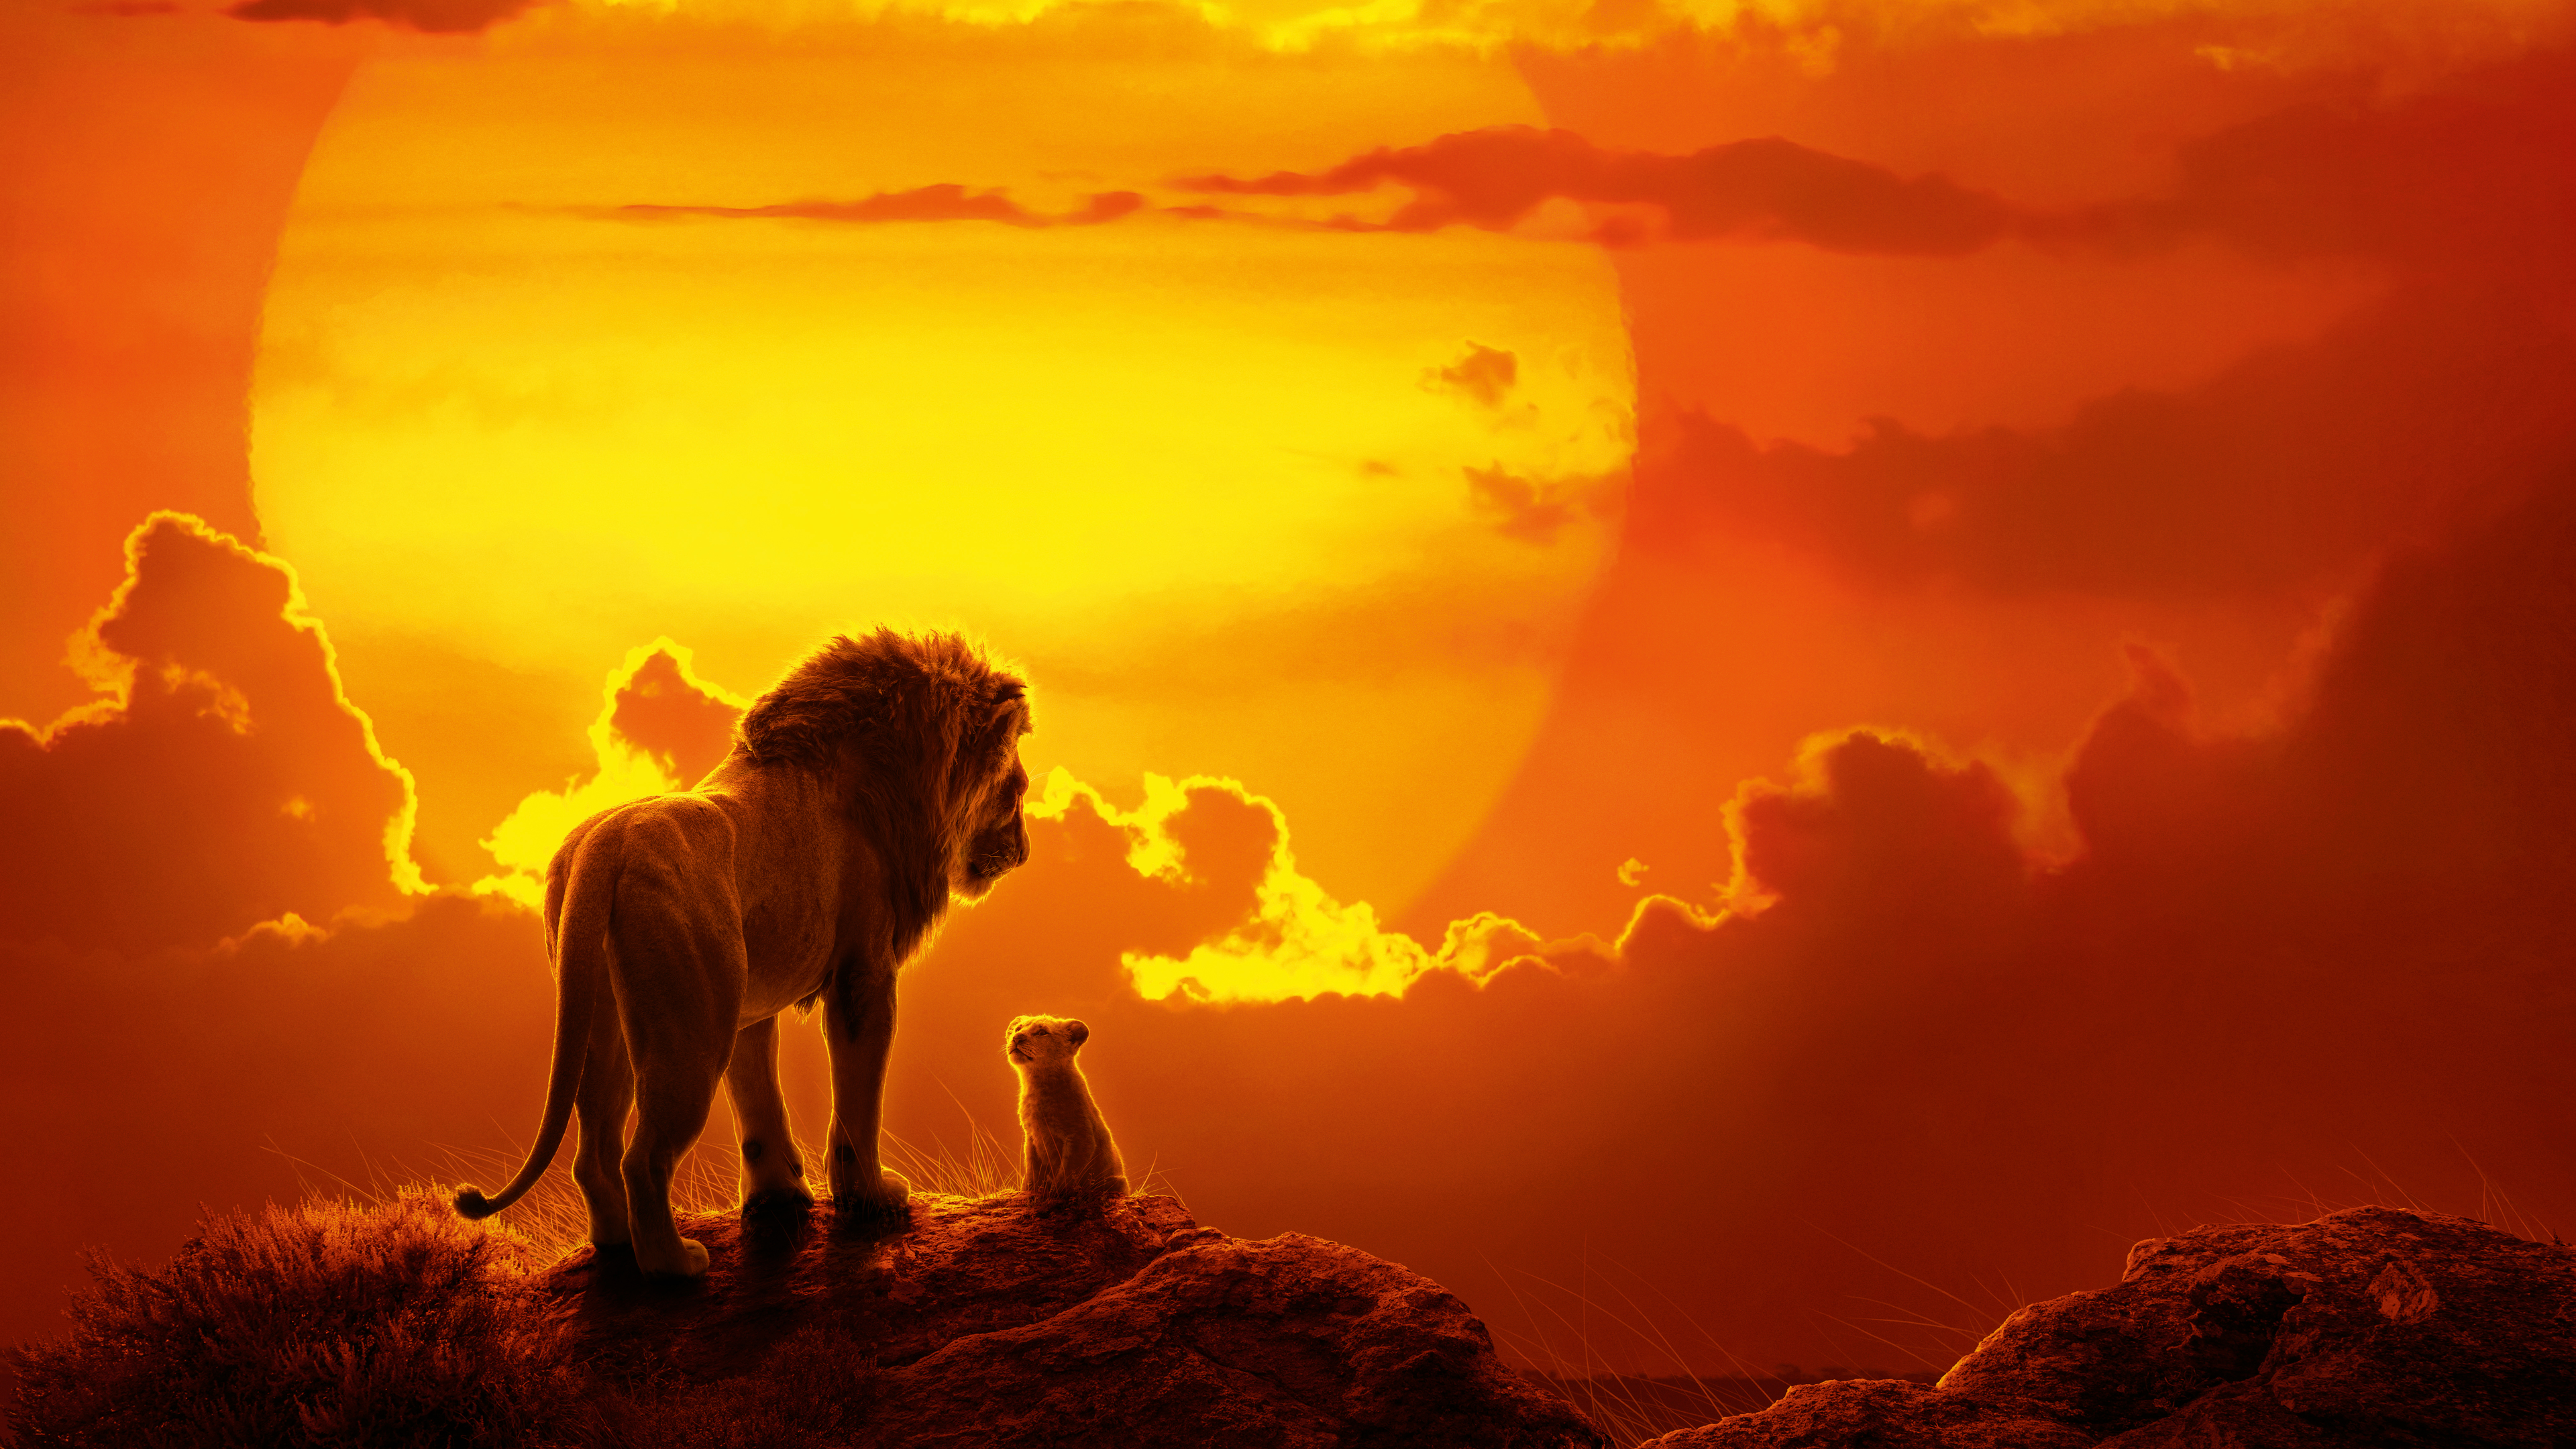 the lion king movie 1562107252 - The Lion King Movie - the lion king wallpapers, simba wallpapers, movies wallpapers, lion wallpapers, hd-wallpapers, disney wallpapers, 8k wallpapers, 5k wallpapers, 4k-wallpapers, 2019 movies wallpapers